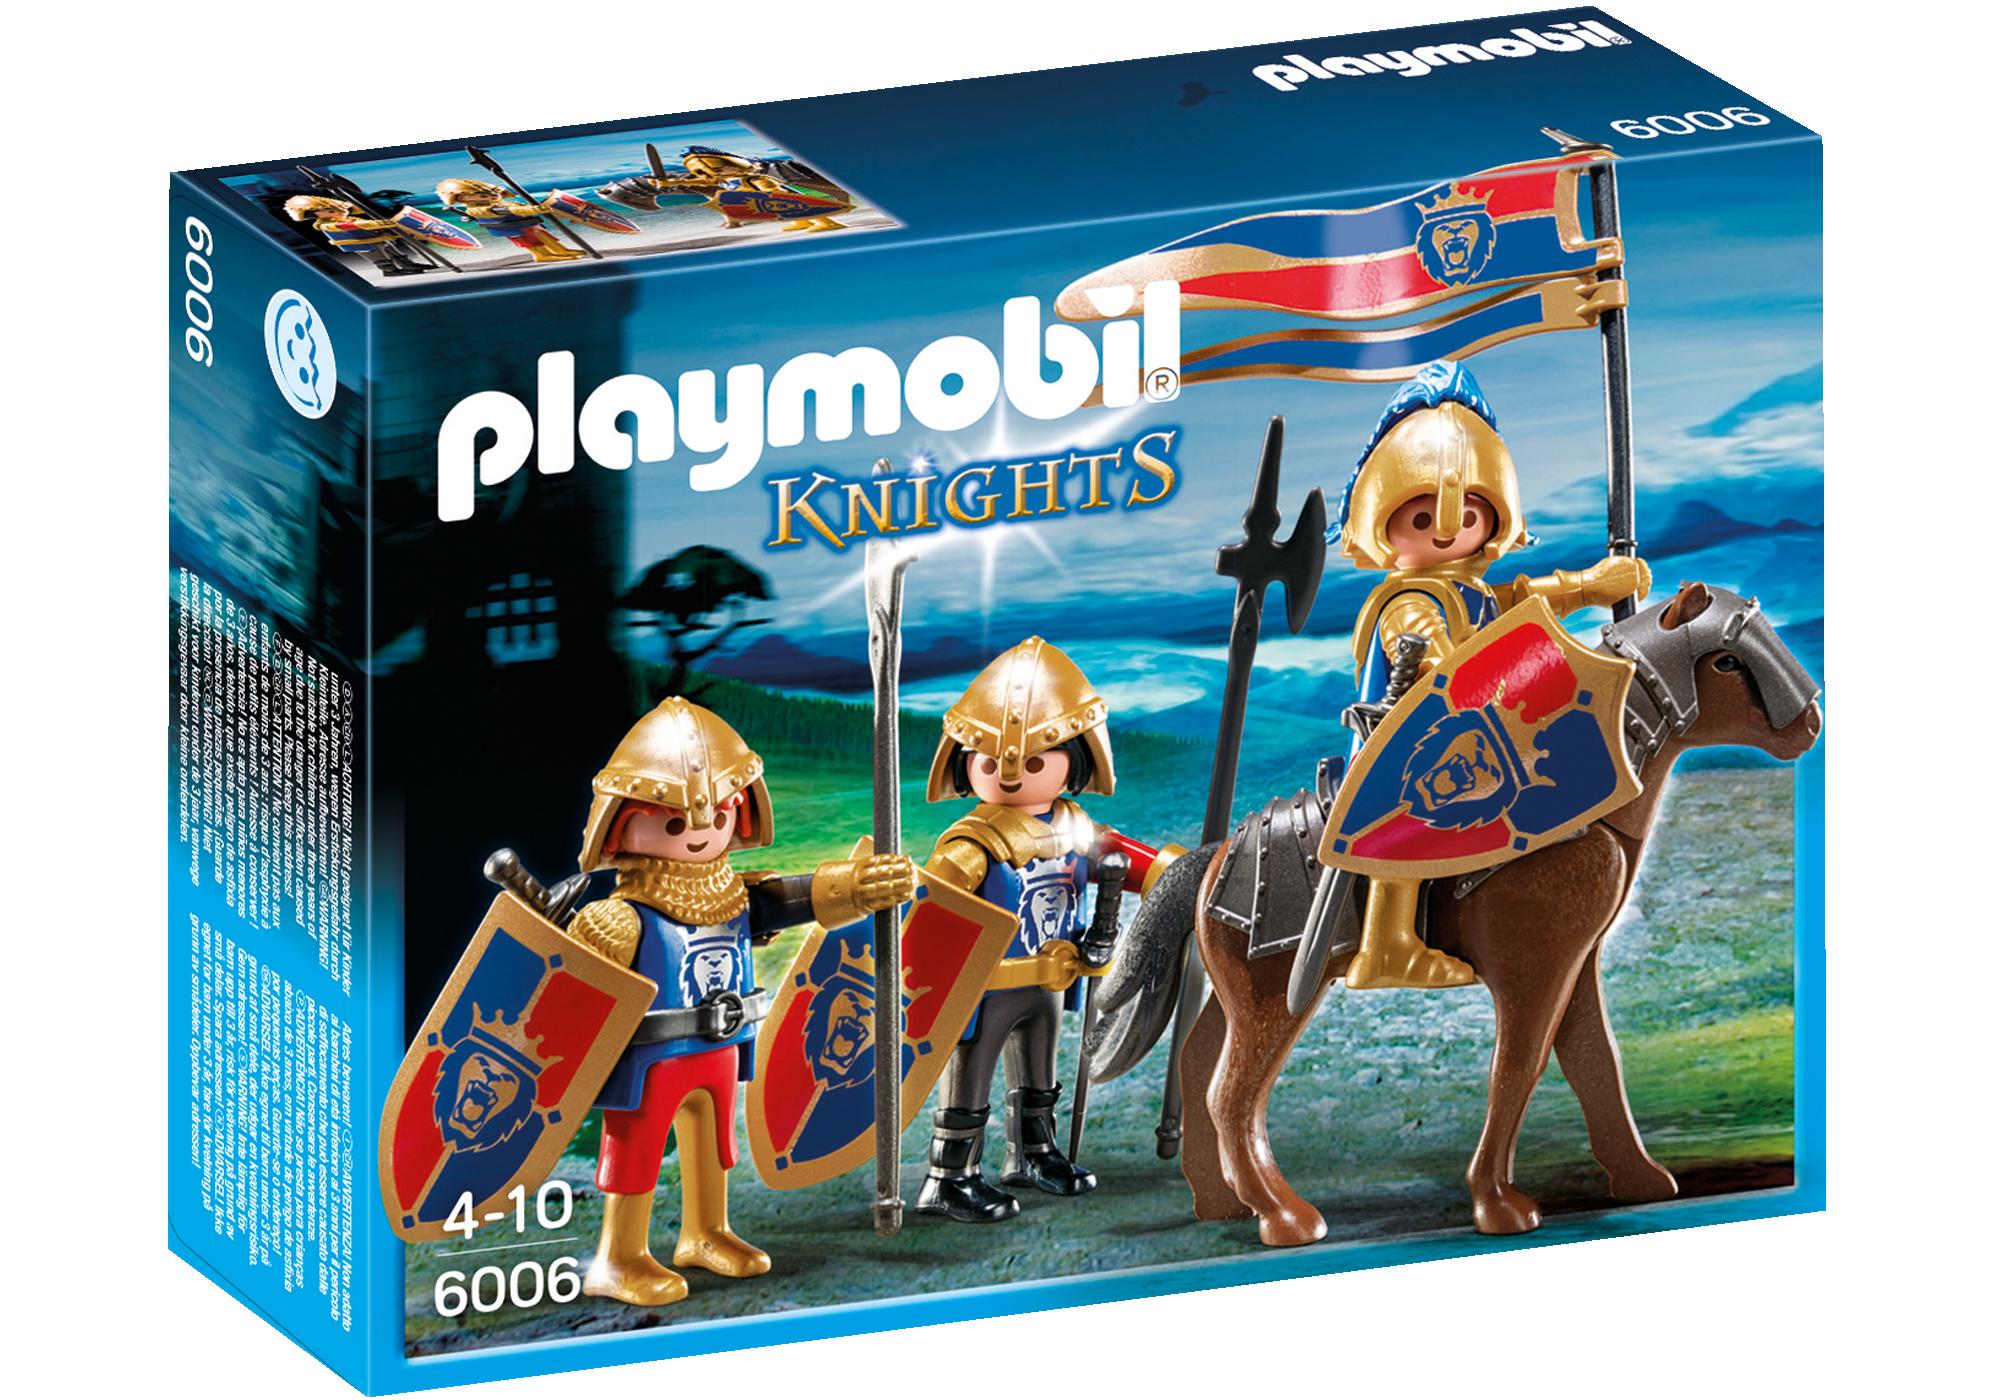 http://media.playmobil.com/i/playmobil/6006_product_box_front/Рыцари: Разведывательный патруль Рыцарей Льва